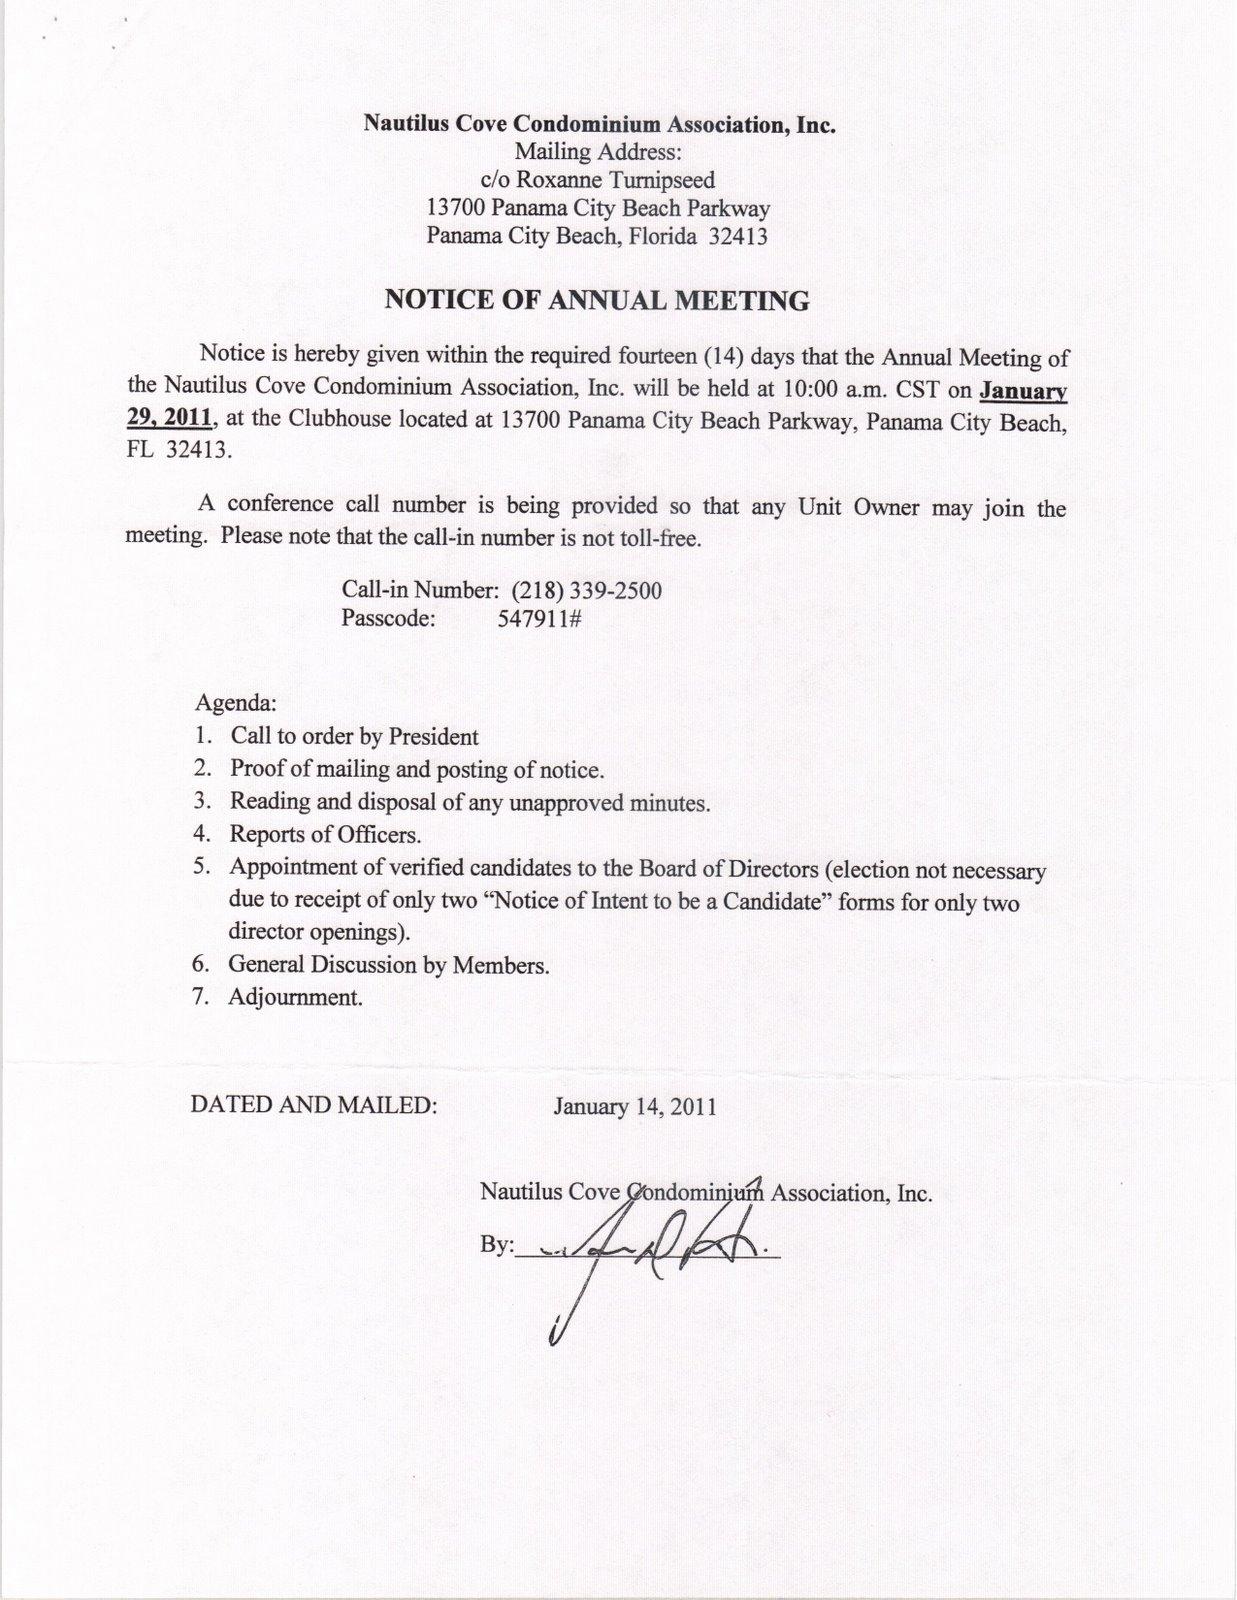 Nautilus Cove Condominium Budgets Past Agms And Bod Meetings